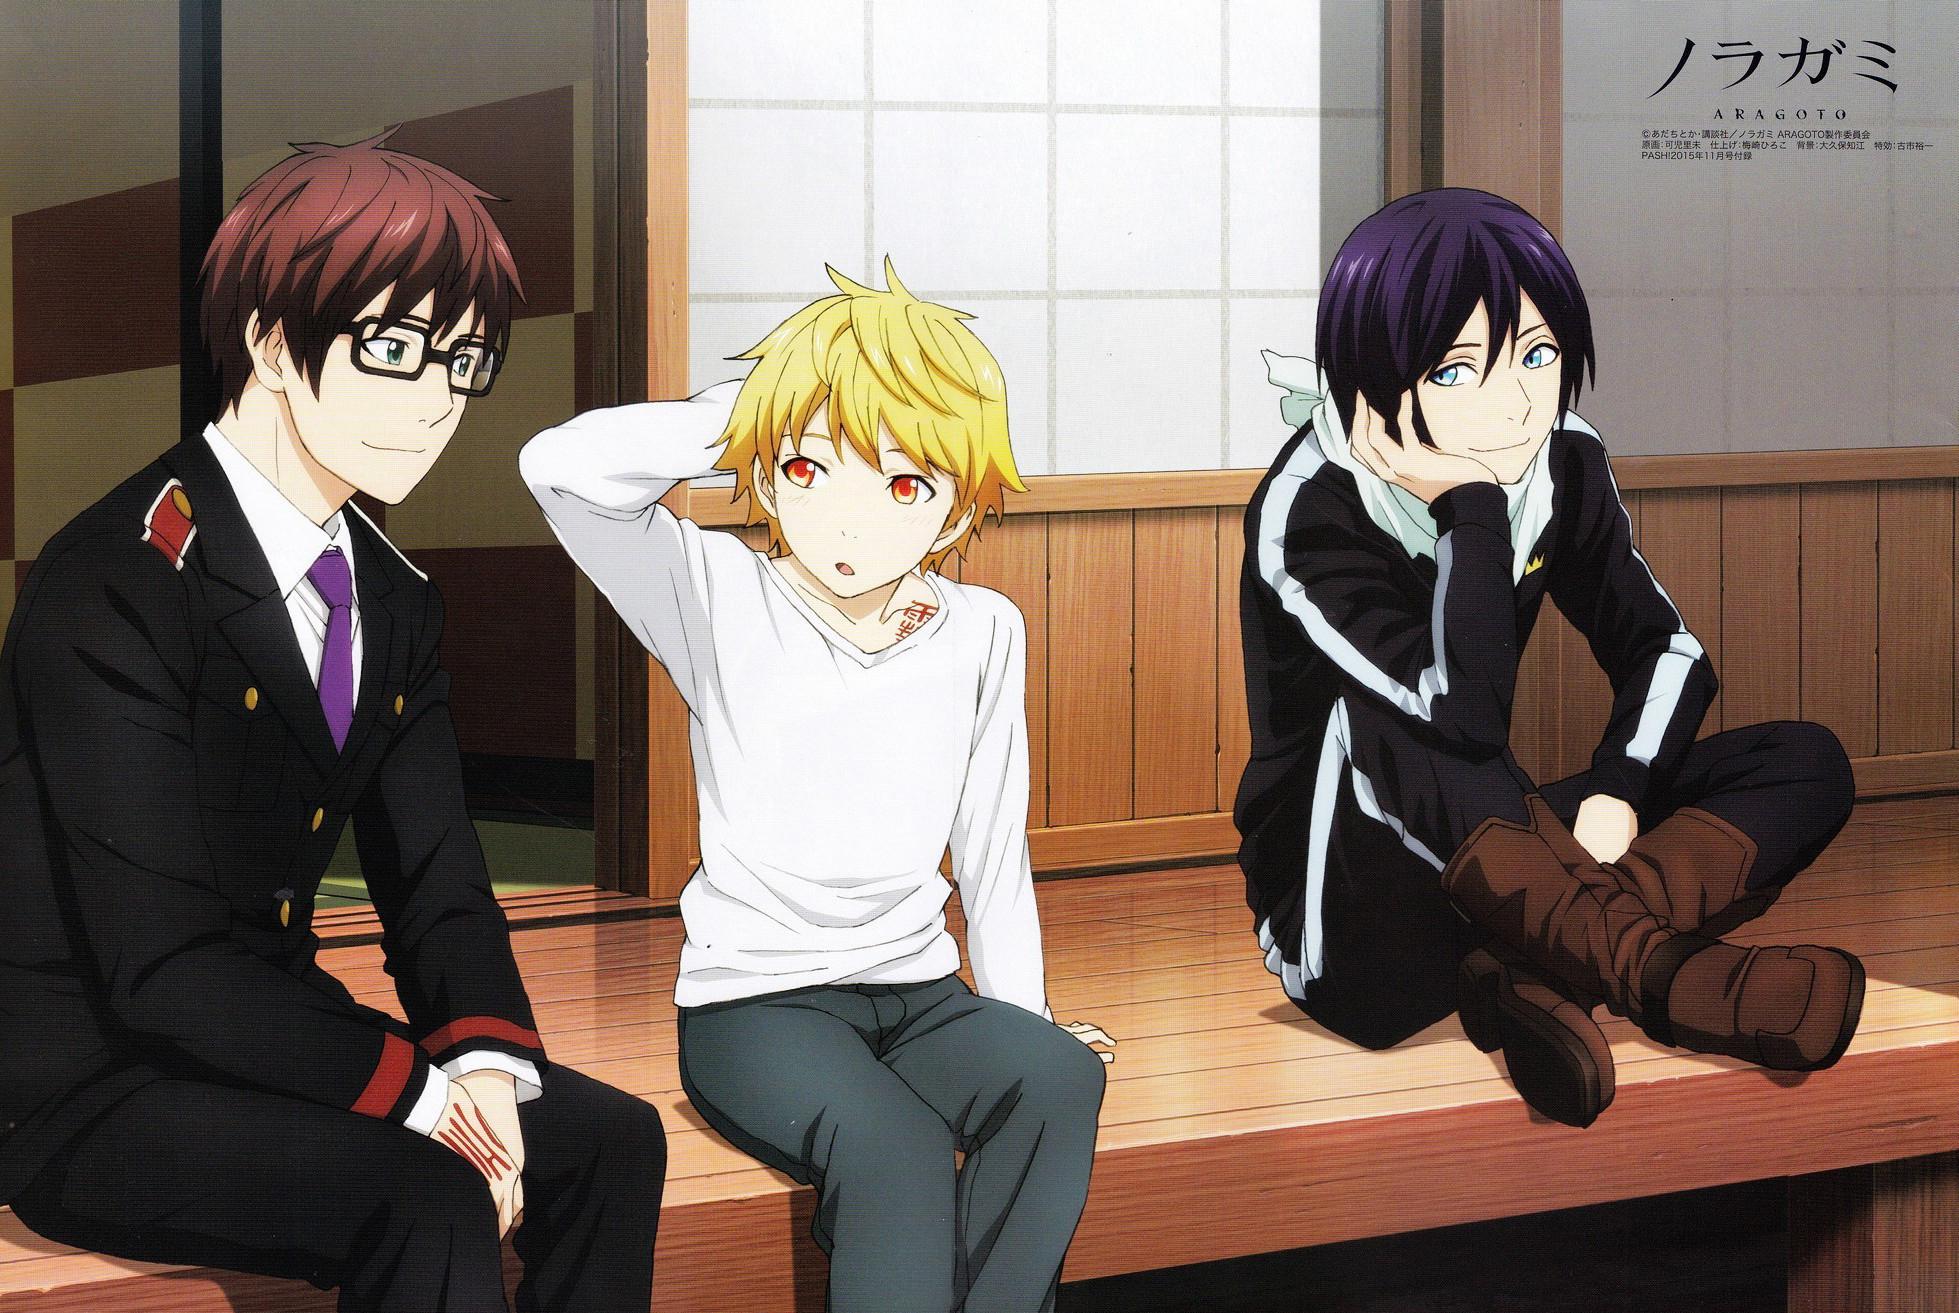 Noragami Aragoto Wallpaper HD Anime by corphish2 Noragami Aragoto Wallpaper  HD Anime by corphish2